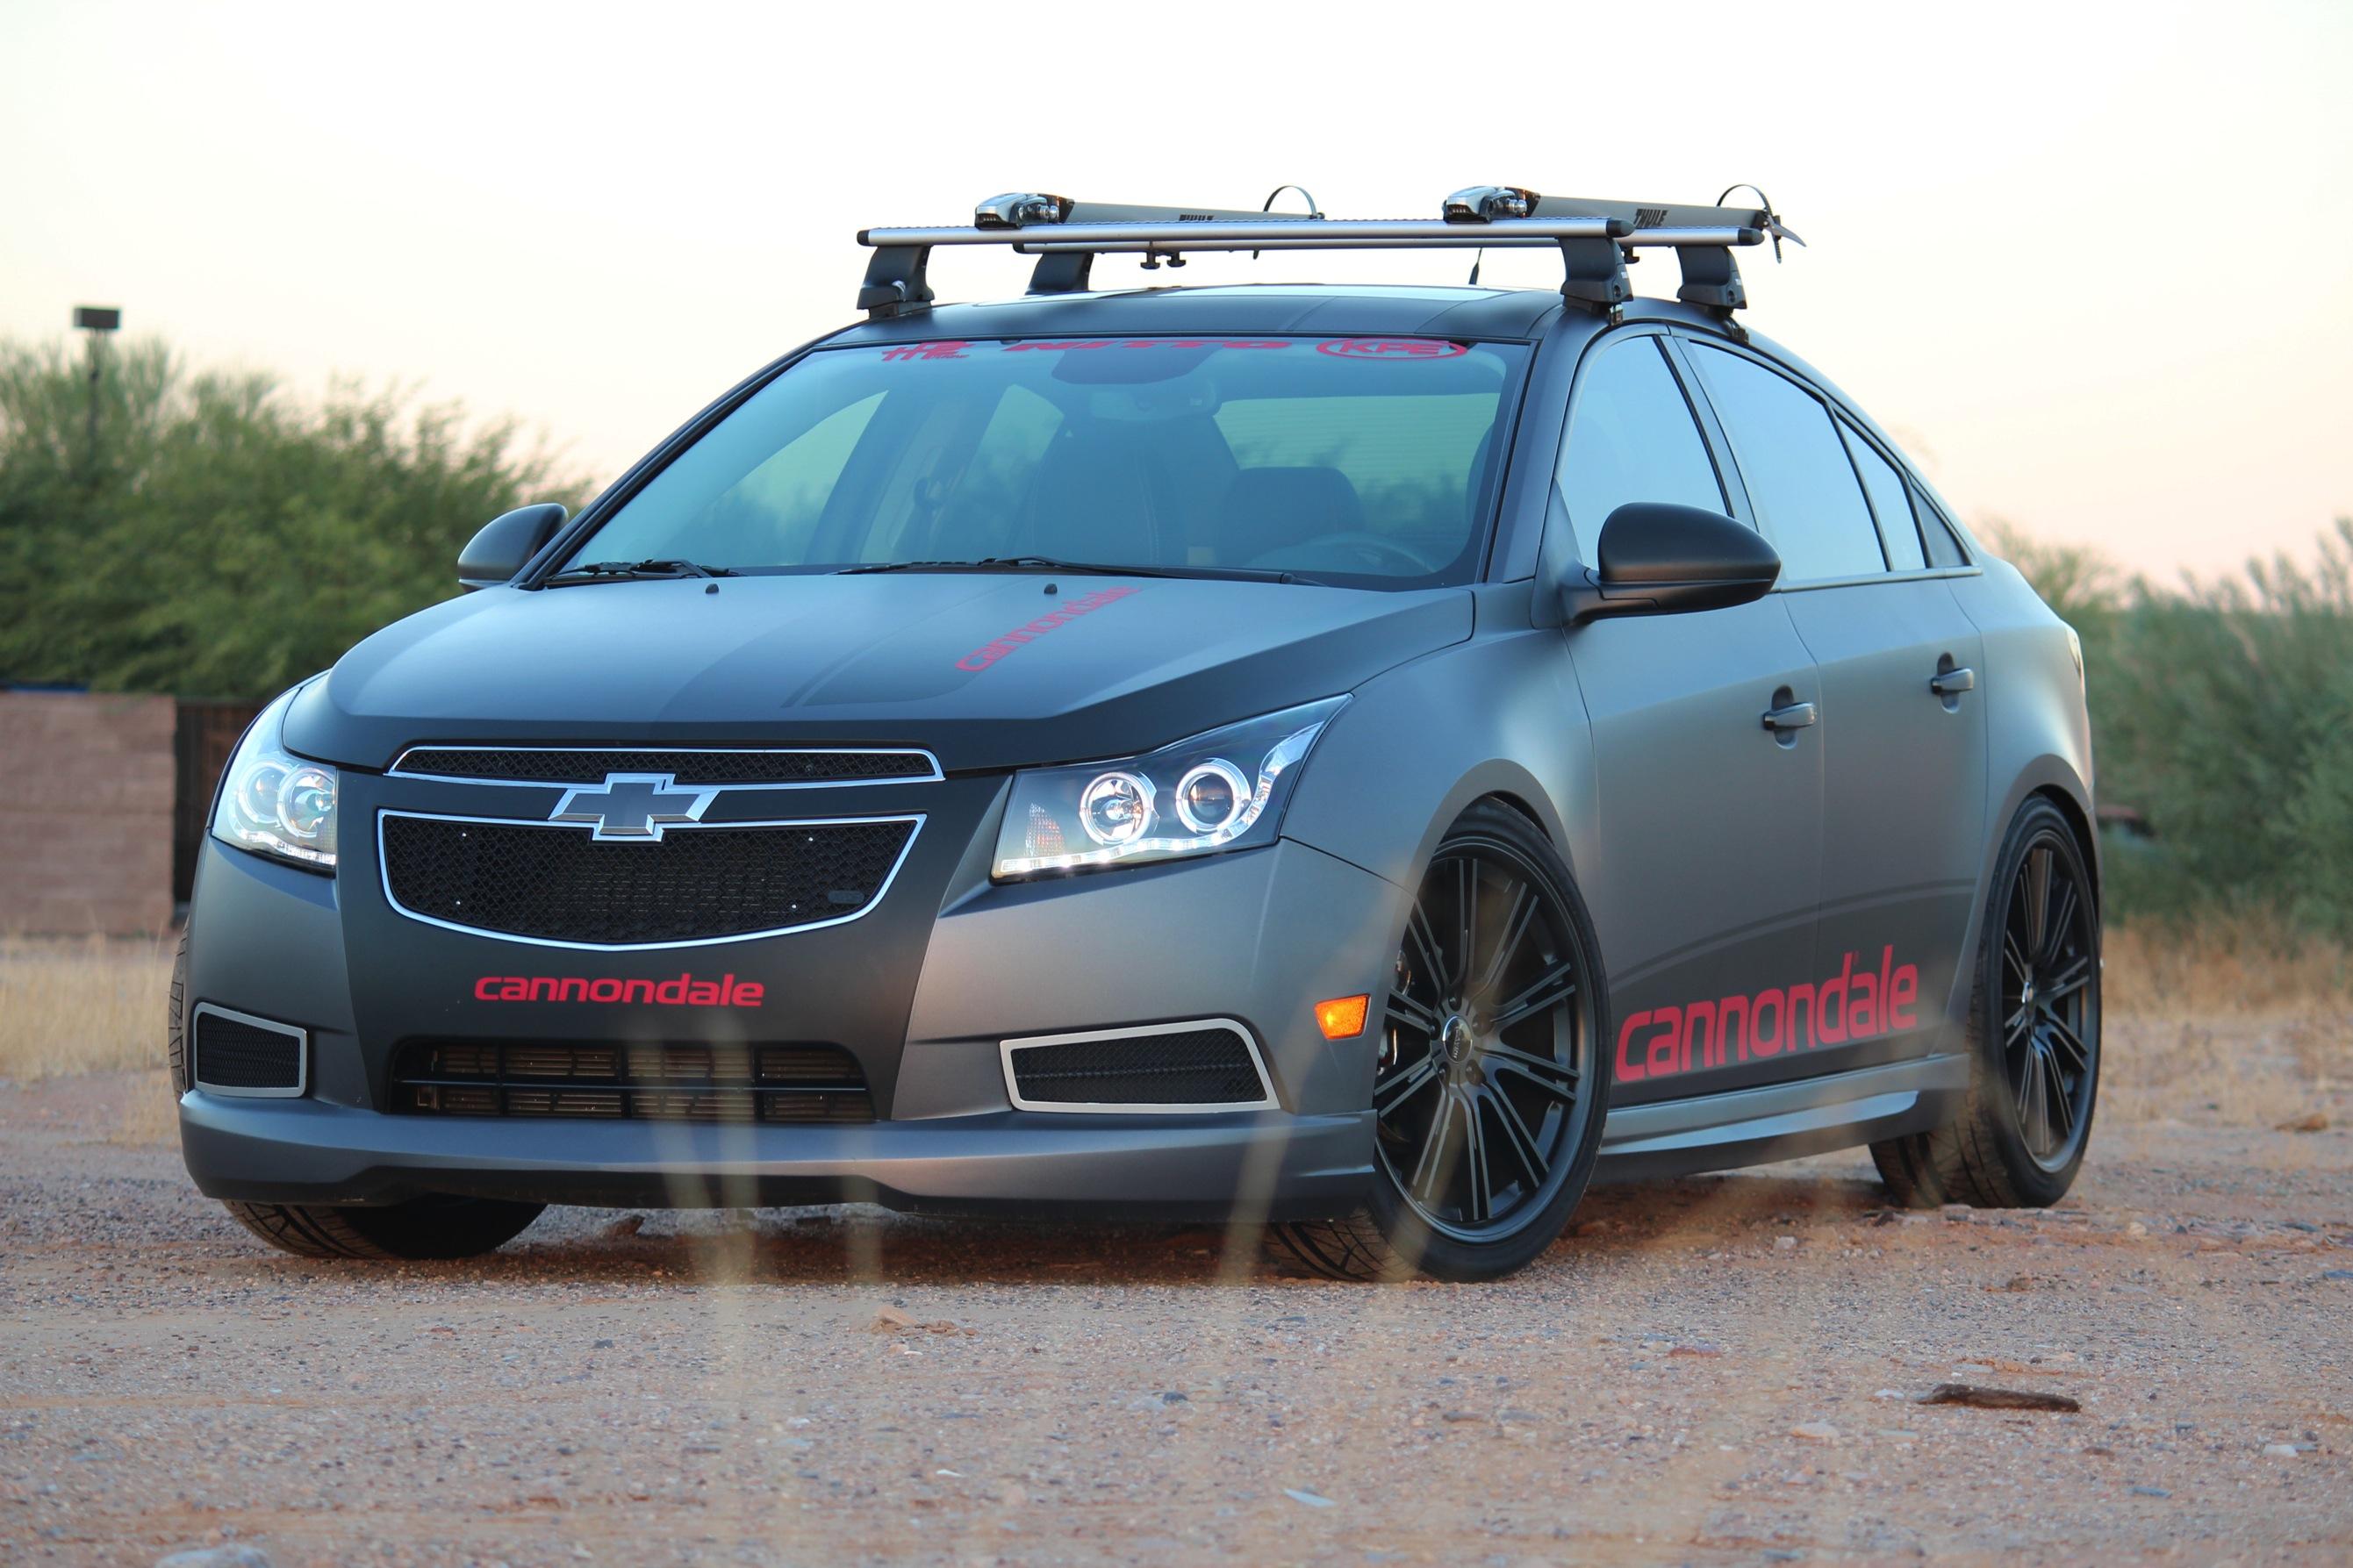 Chevy Cruze Ecu Calibration Korkar Performance Engineering